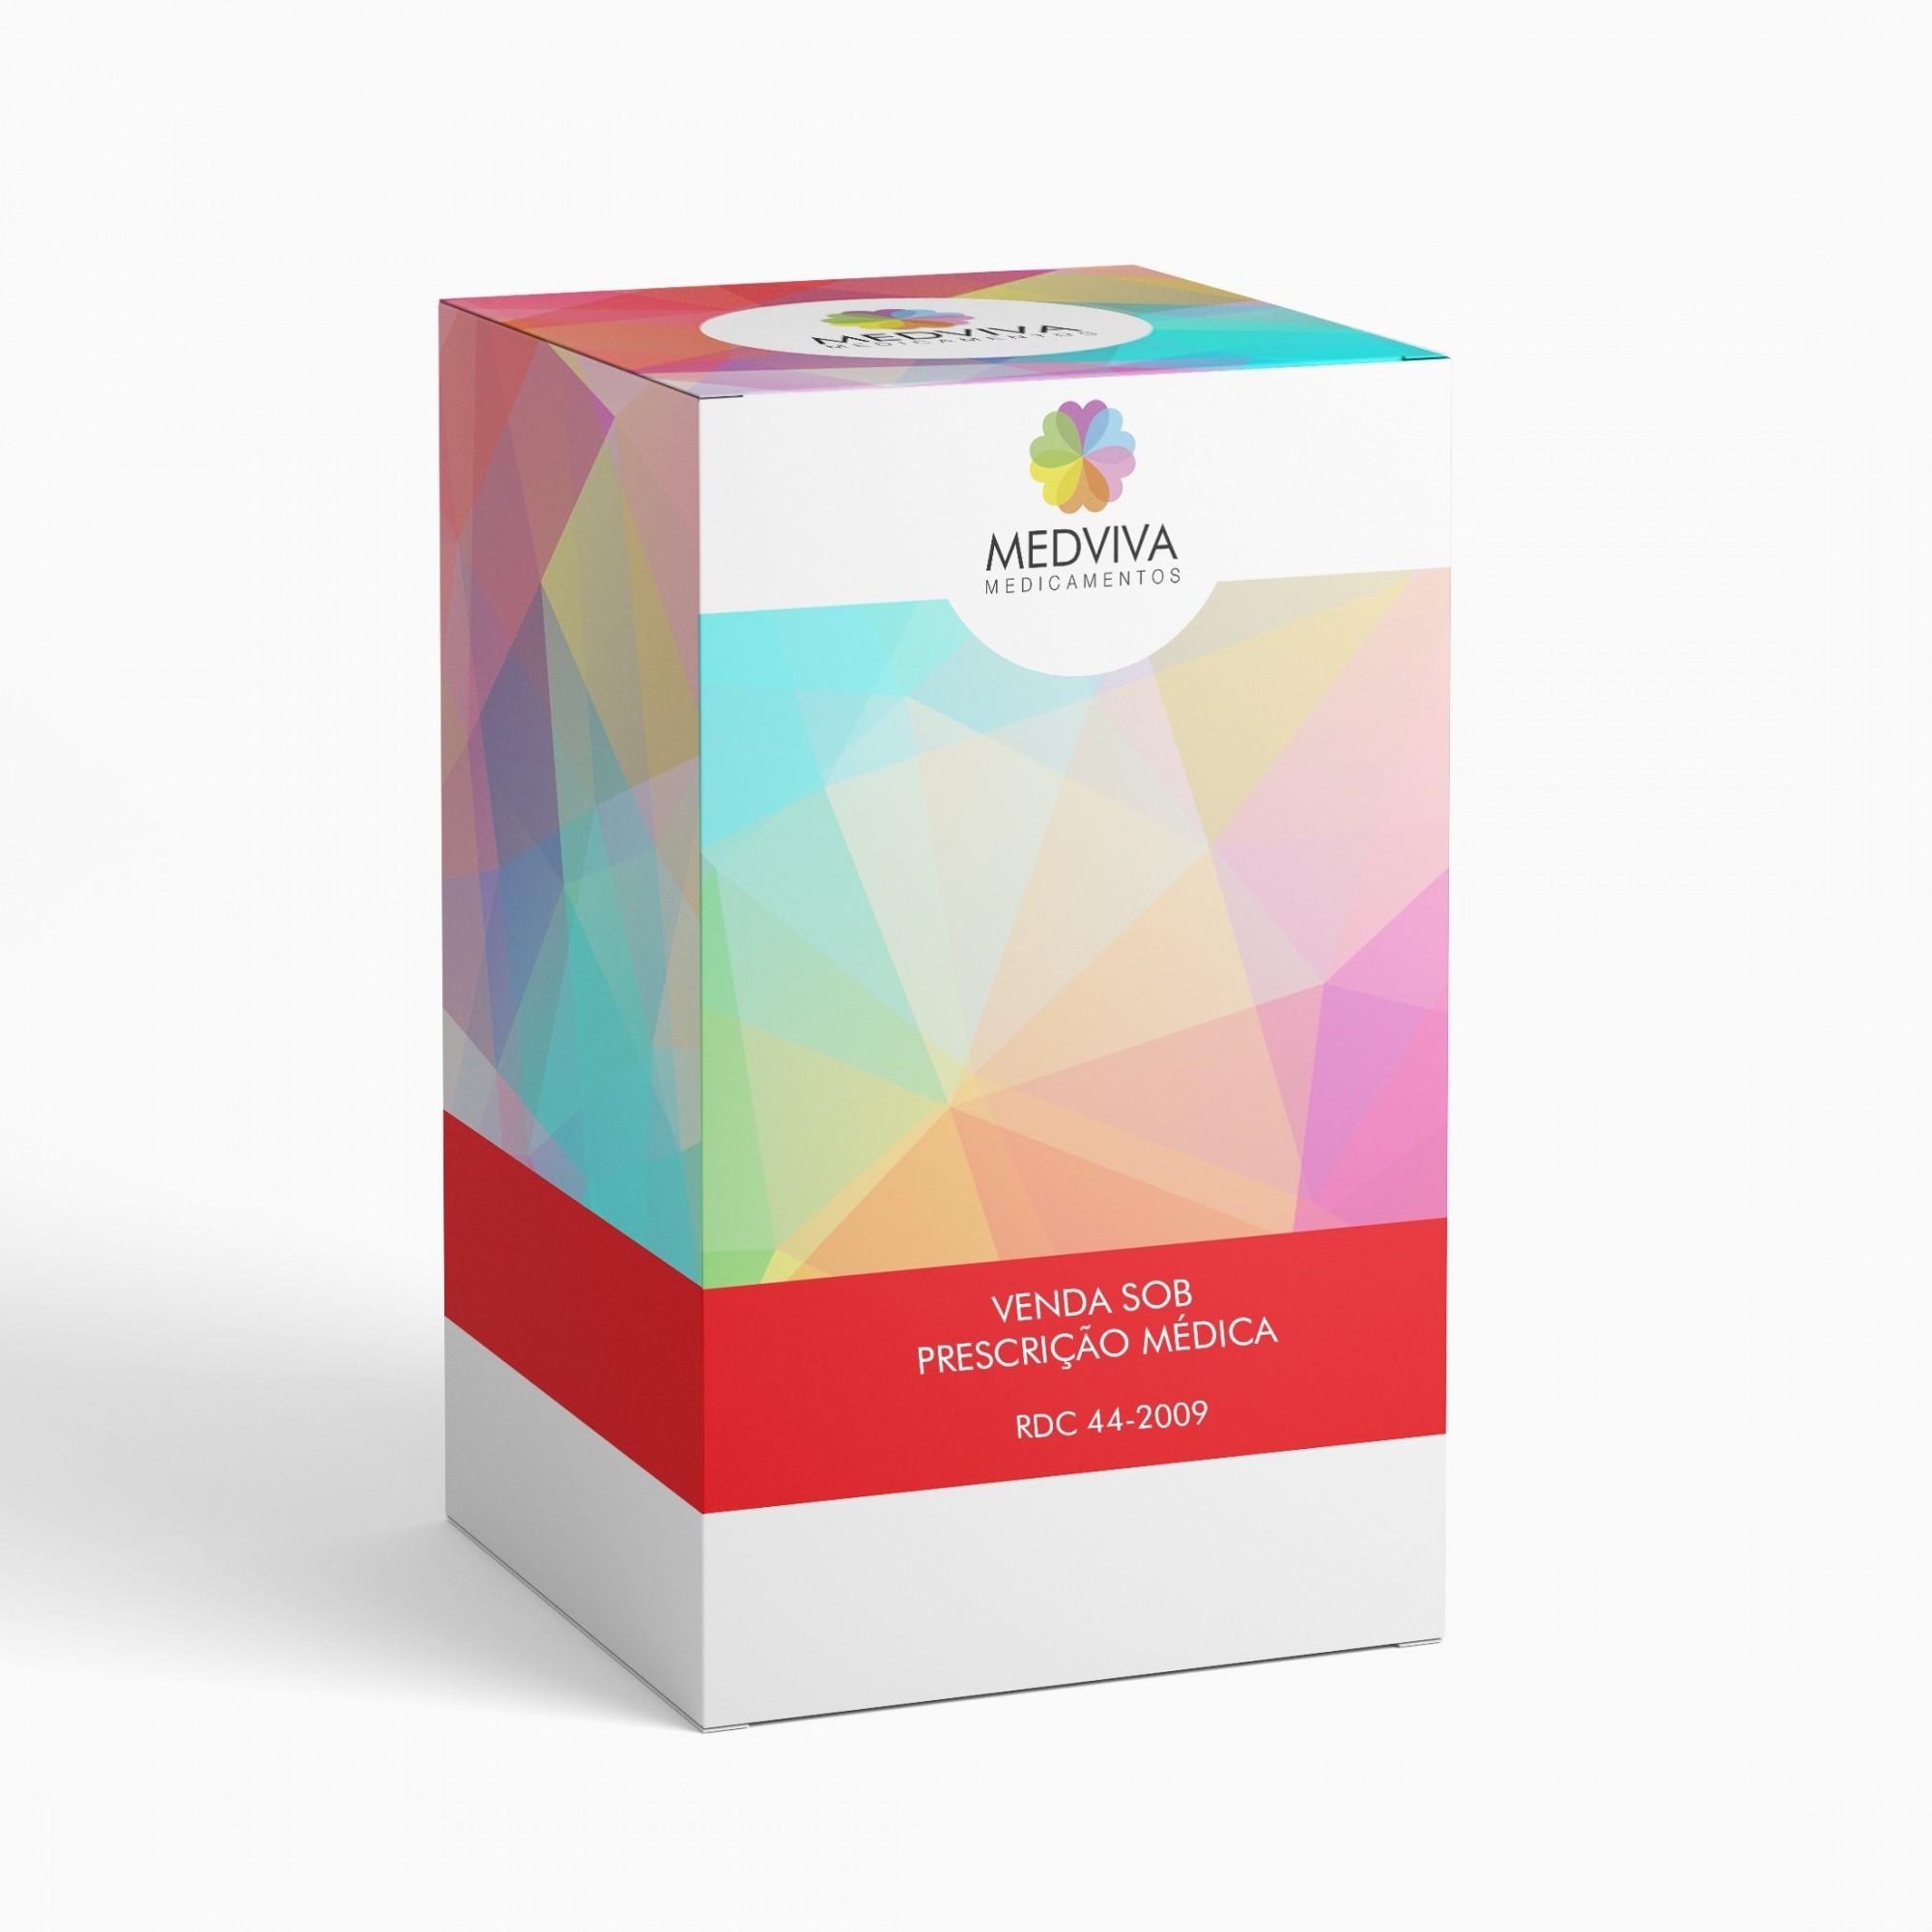 Adriblastina Rd 10 mg 1 Comprimido